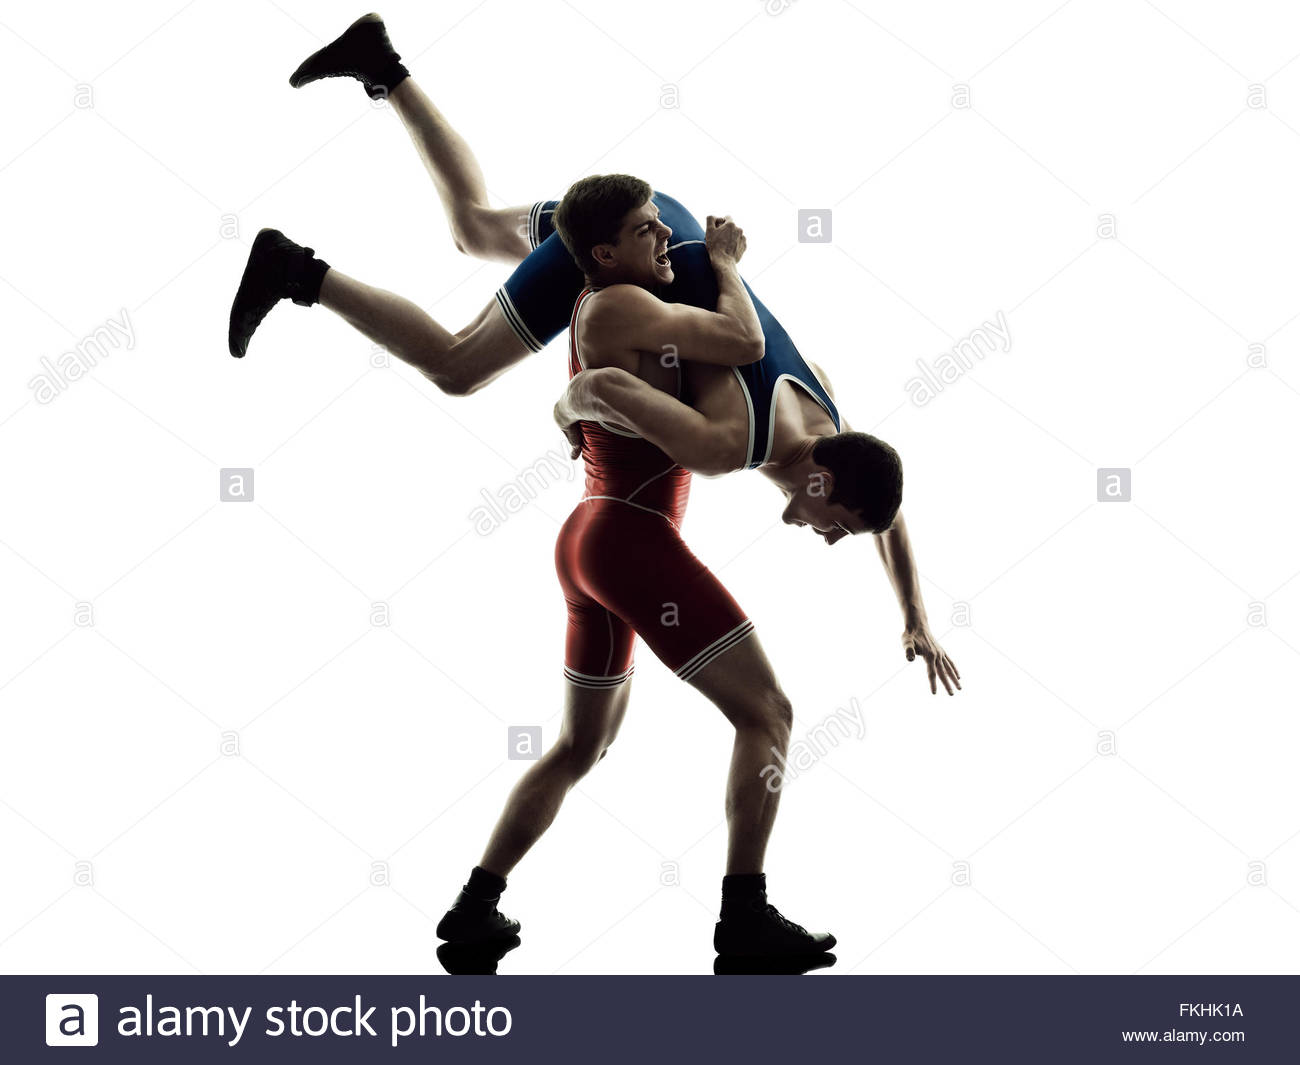 1300x1065 Two Caucasian Wrestlers Wrestling Men On Isolated Silhouette White